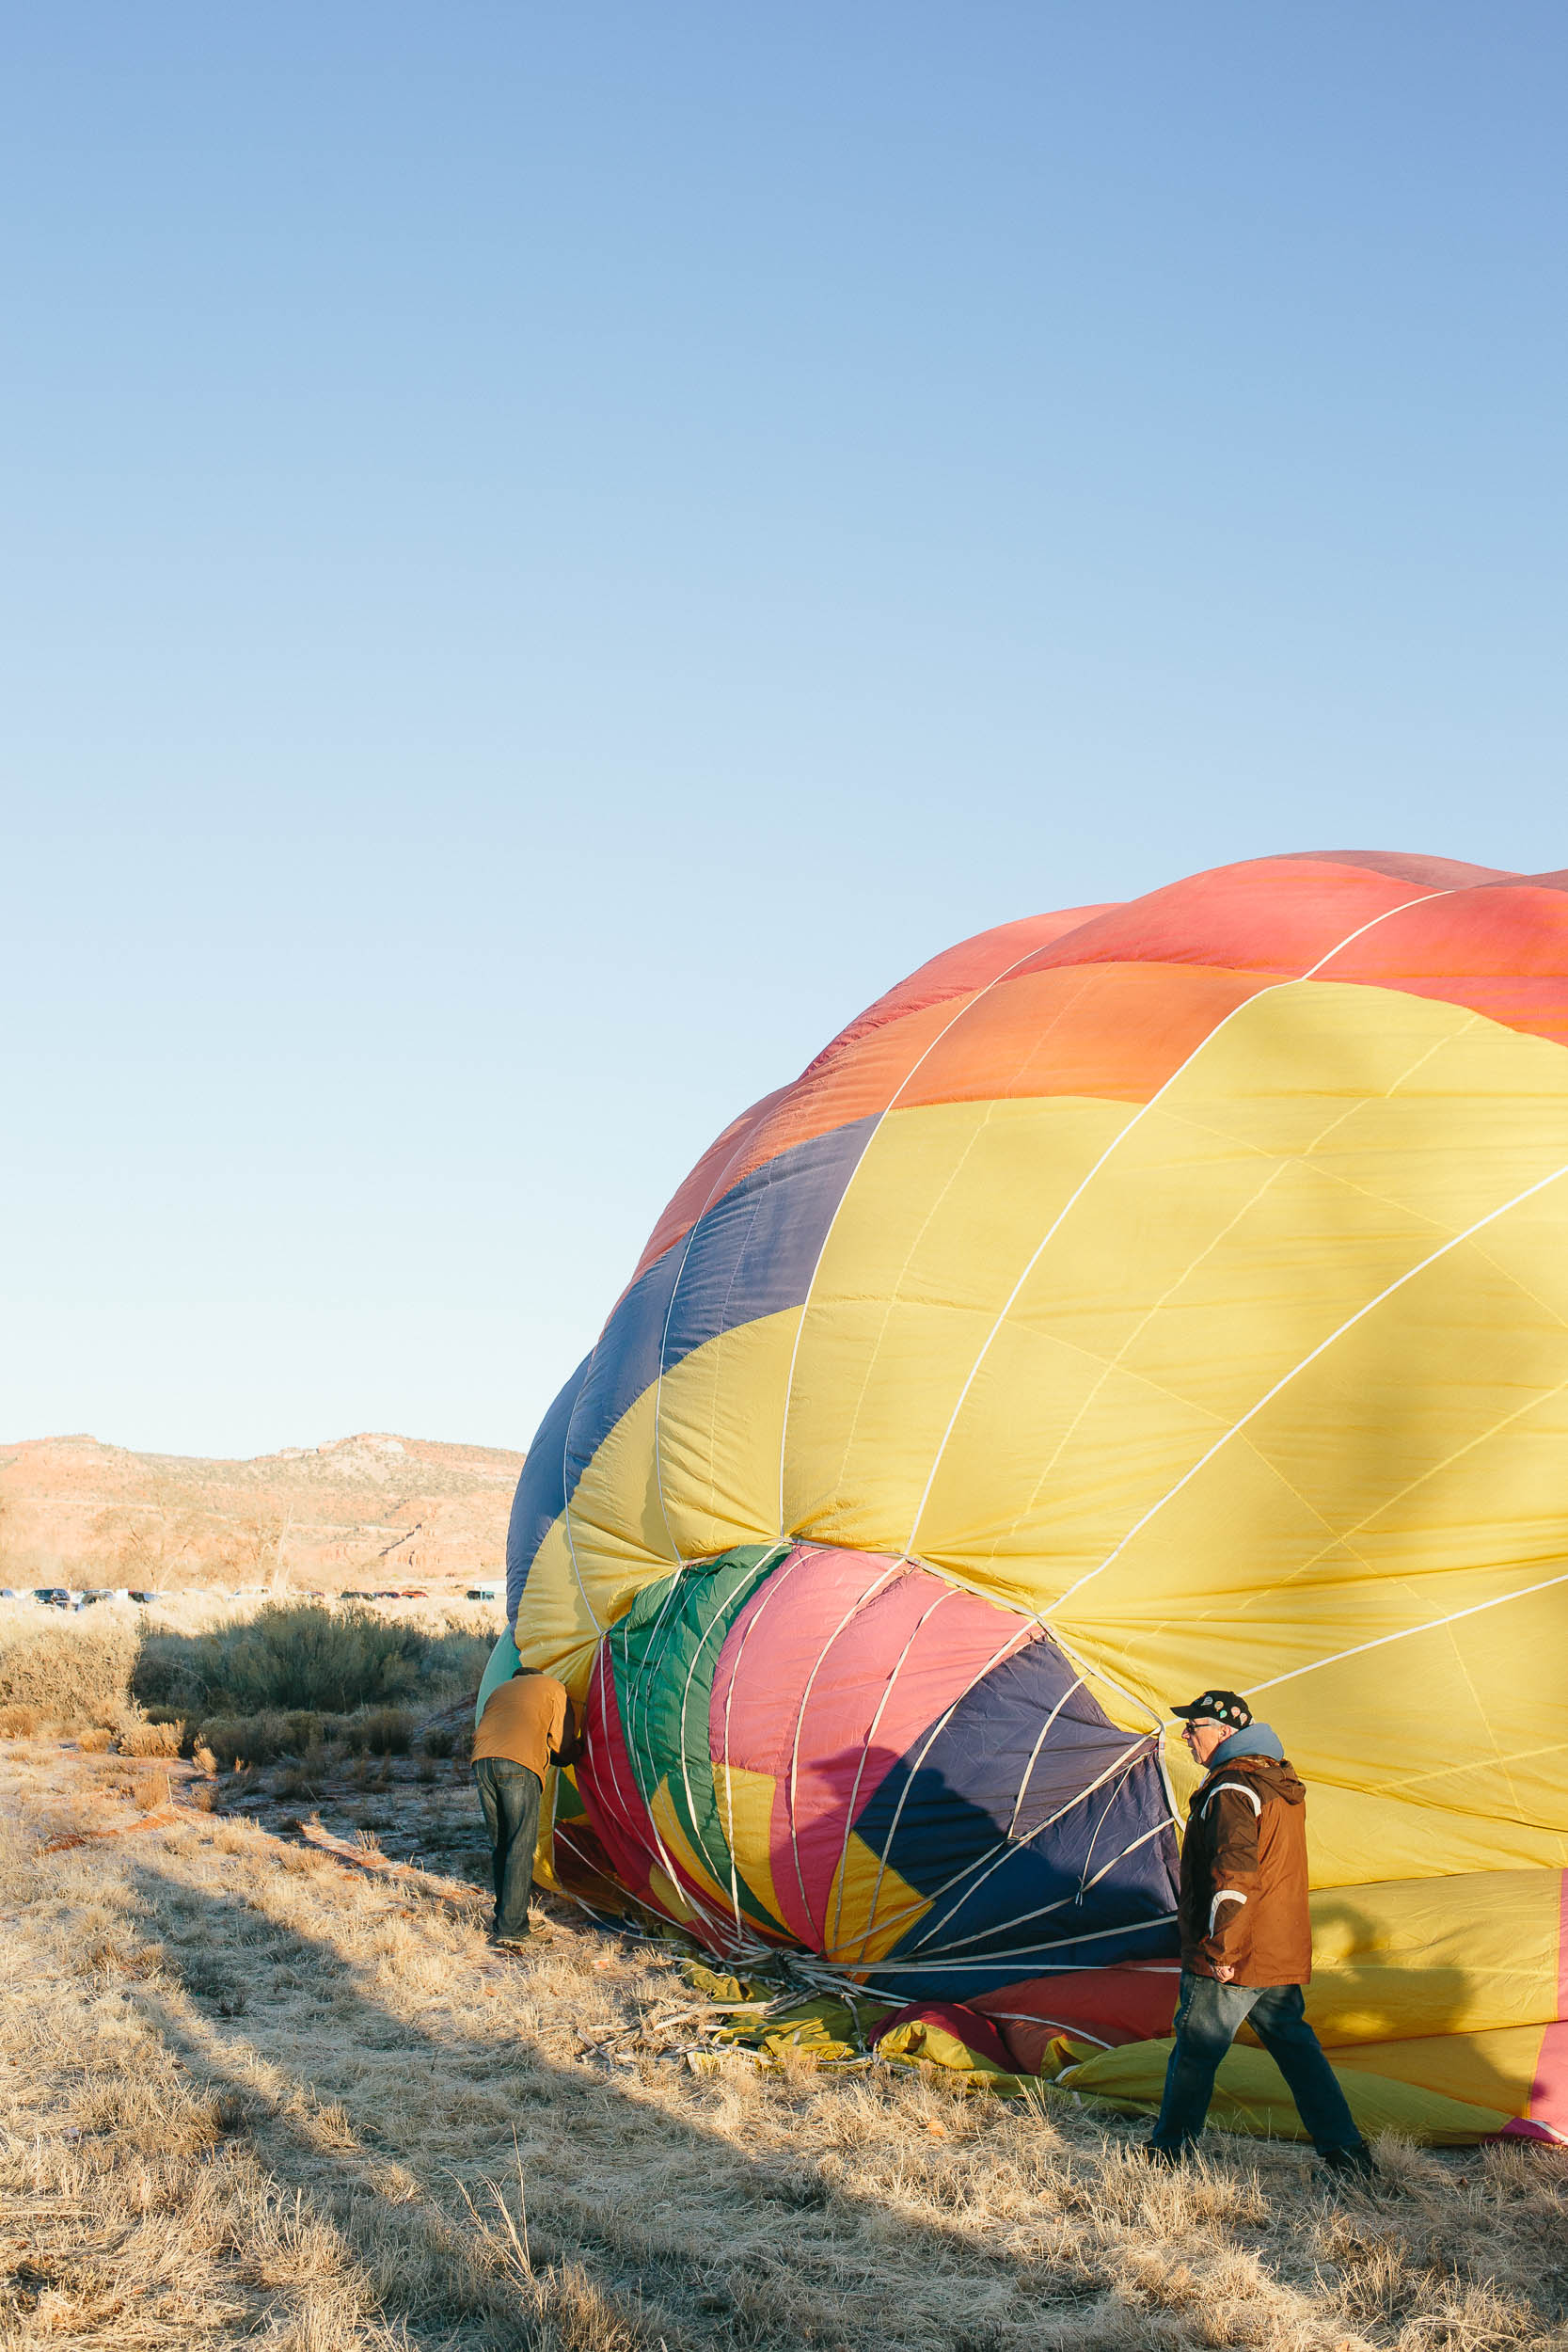 Kyle-Sheppard-Kanab-Balloon-Festival-2.jpg